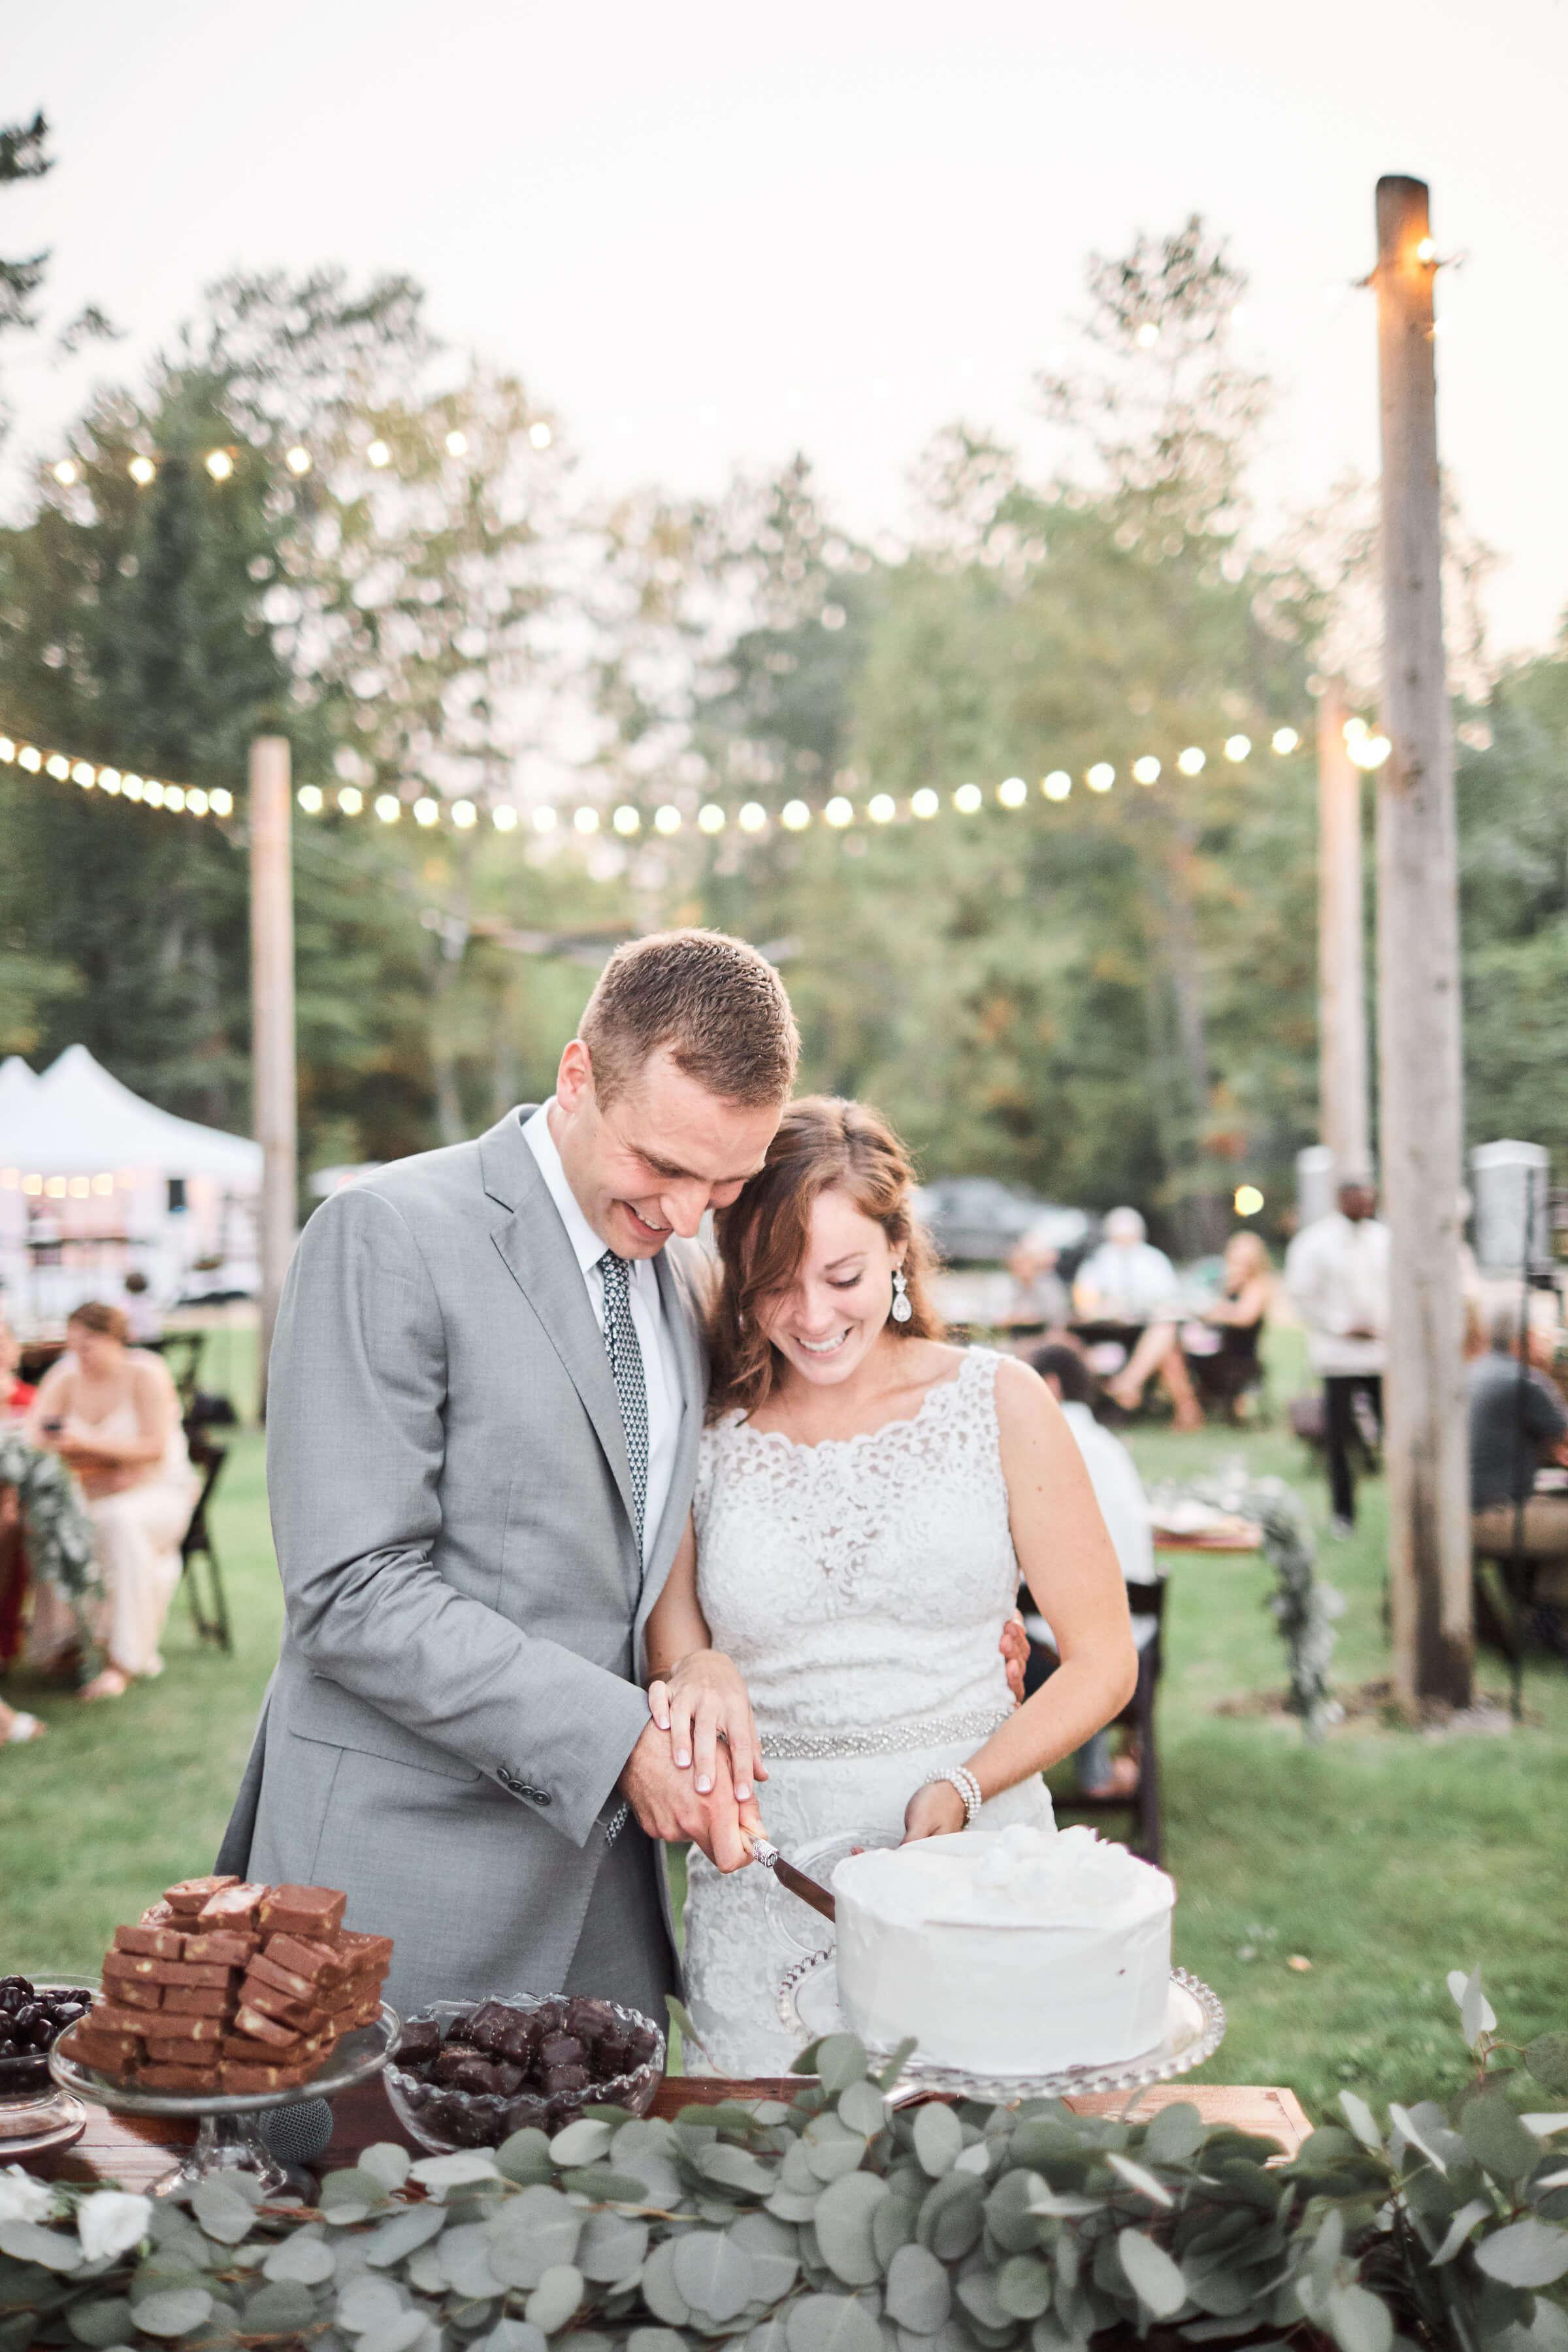 engle-olson-wedding-perry-james-photography-52.jpg